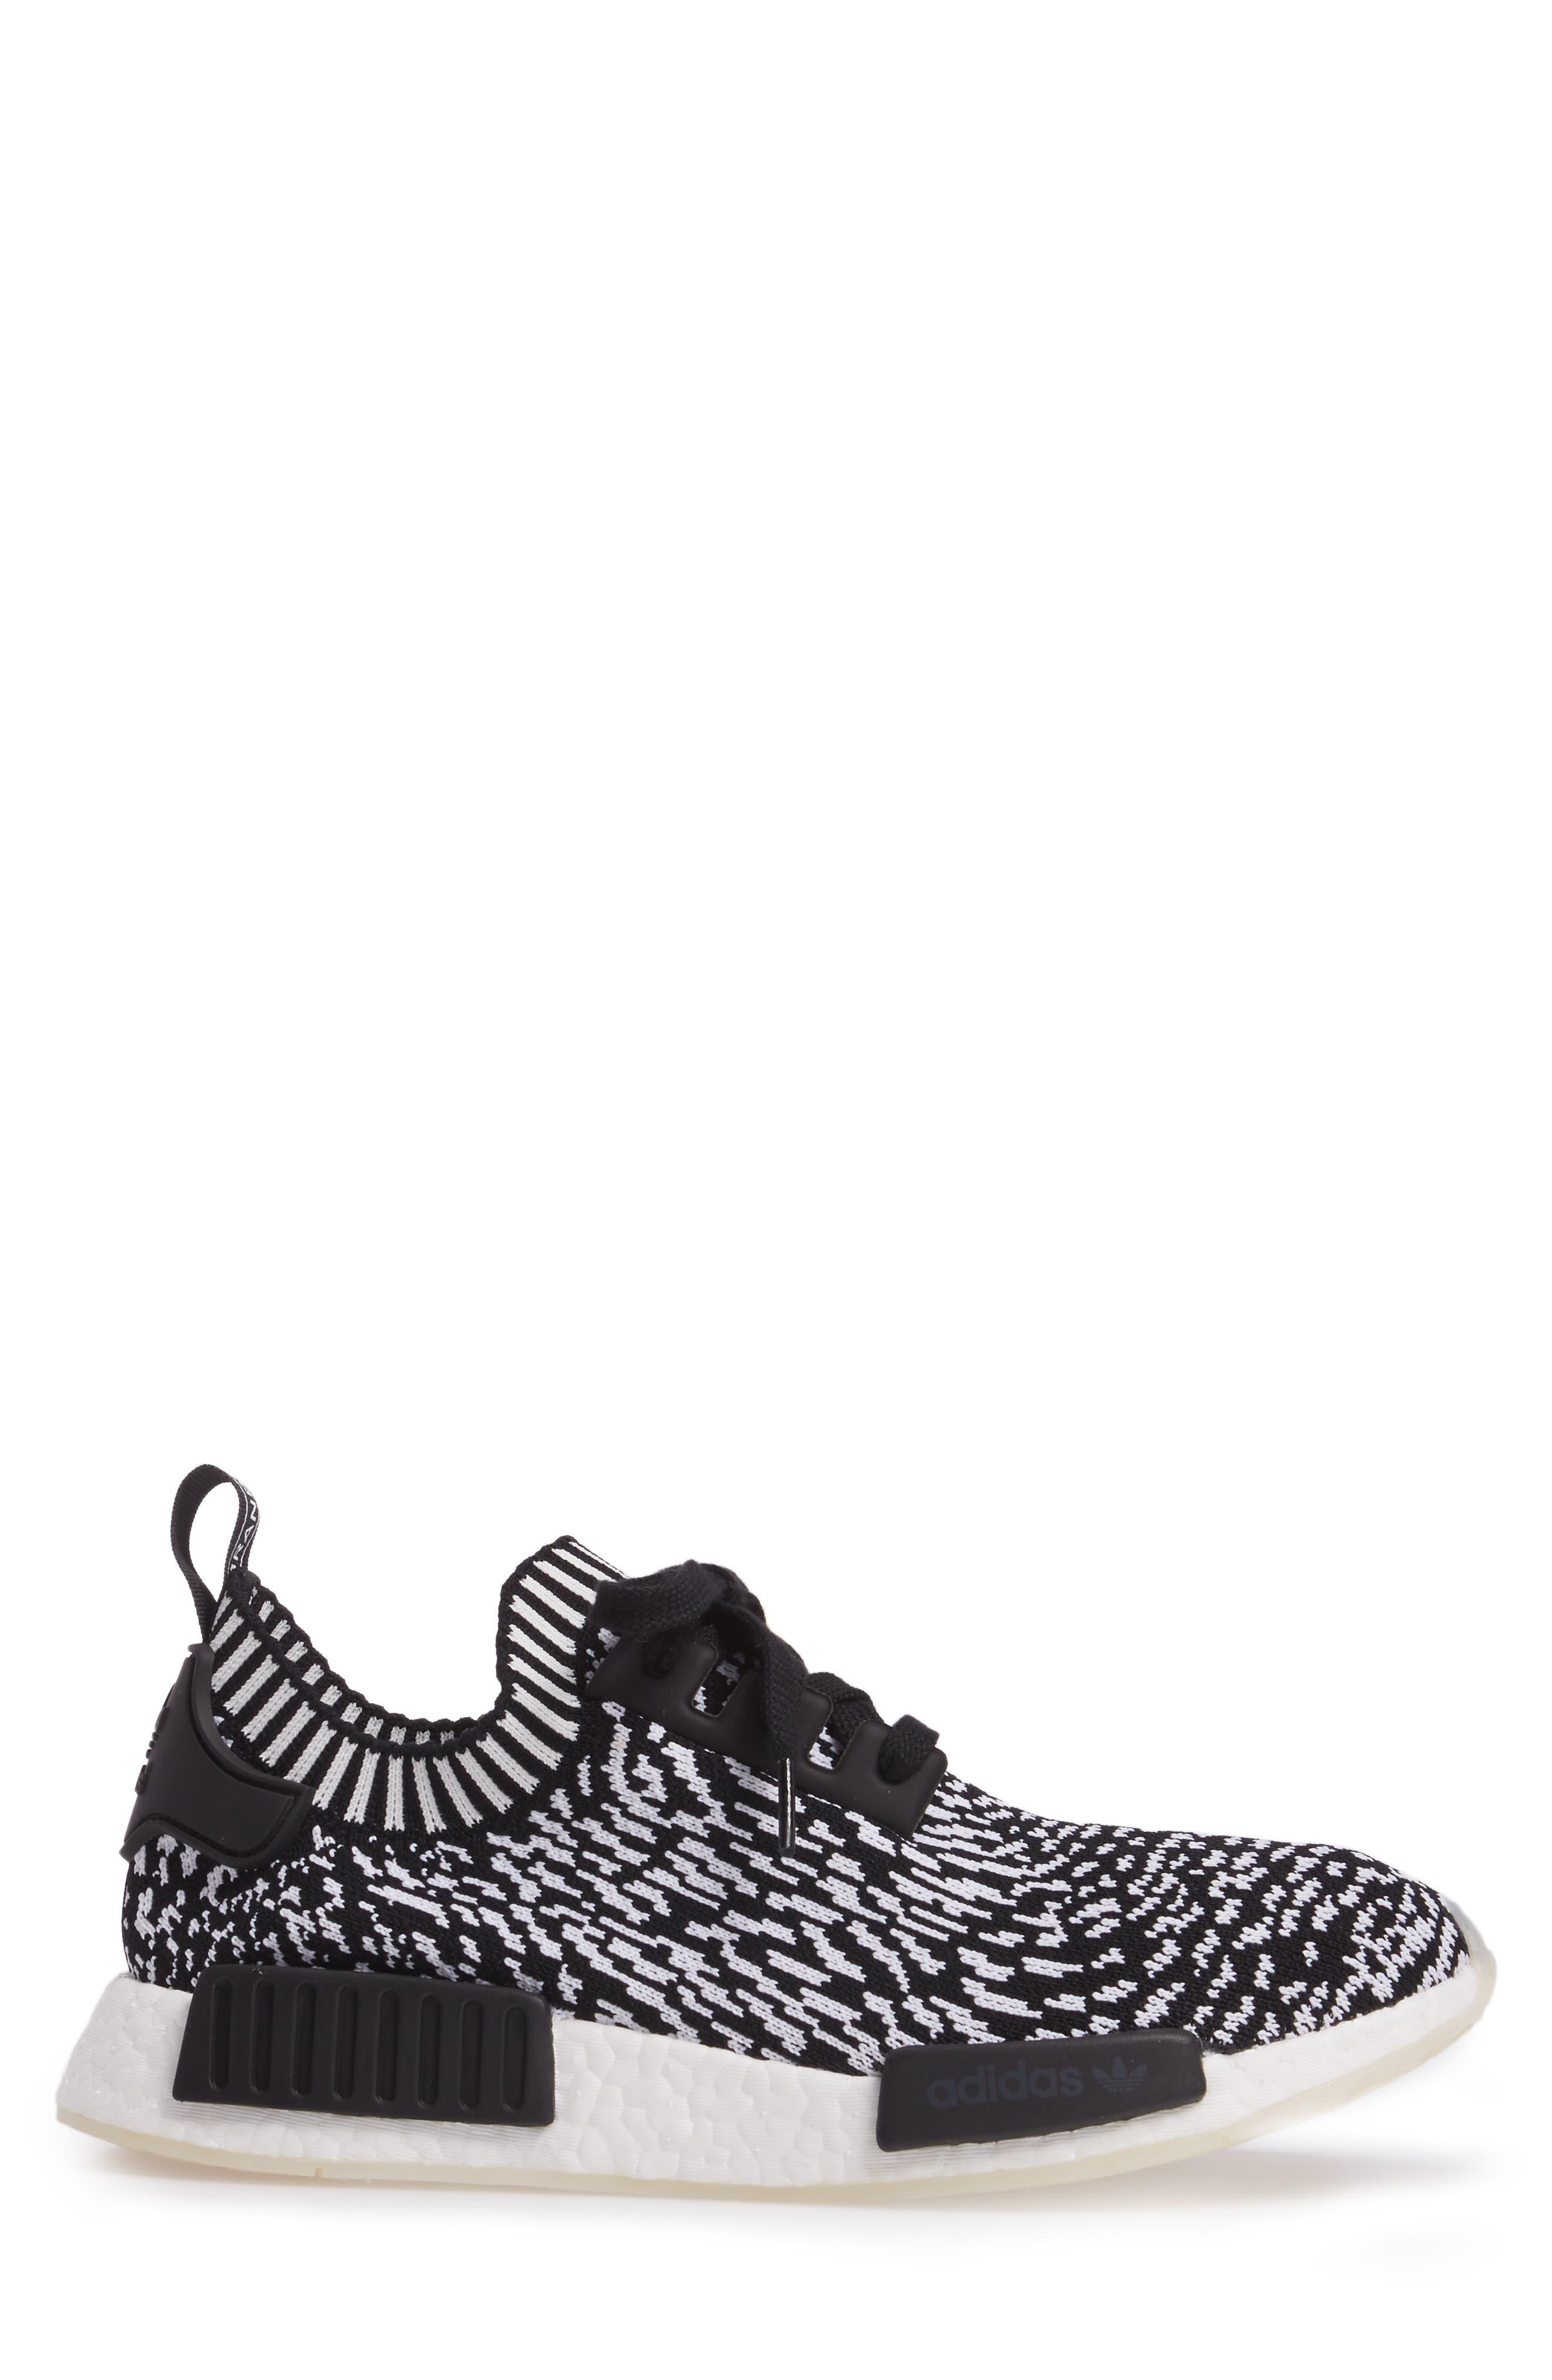 NMD R1 Primeknit Sneaker,                             Alternate thumbnail 3, color,                             Core Black/ Core Black/ White